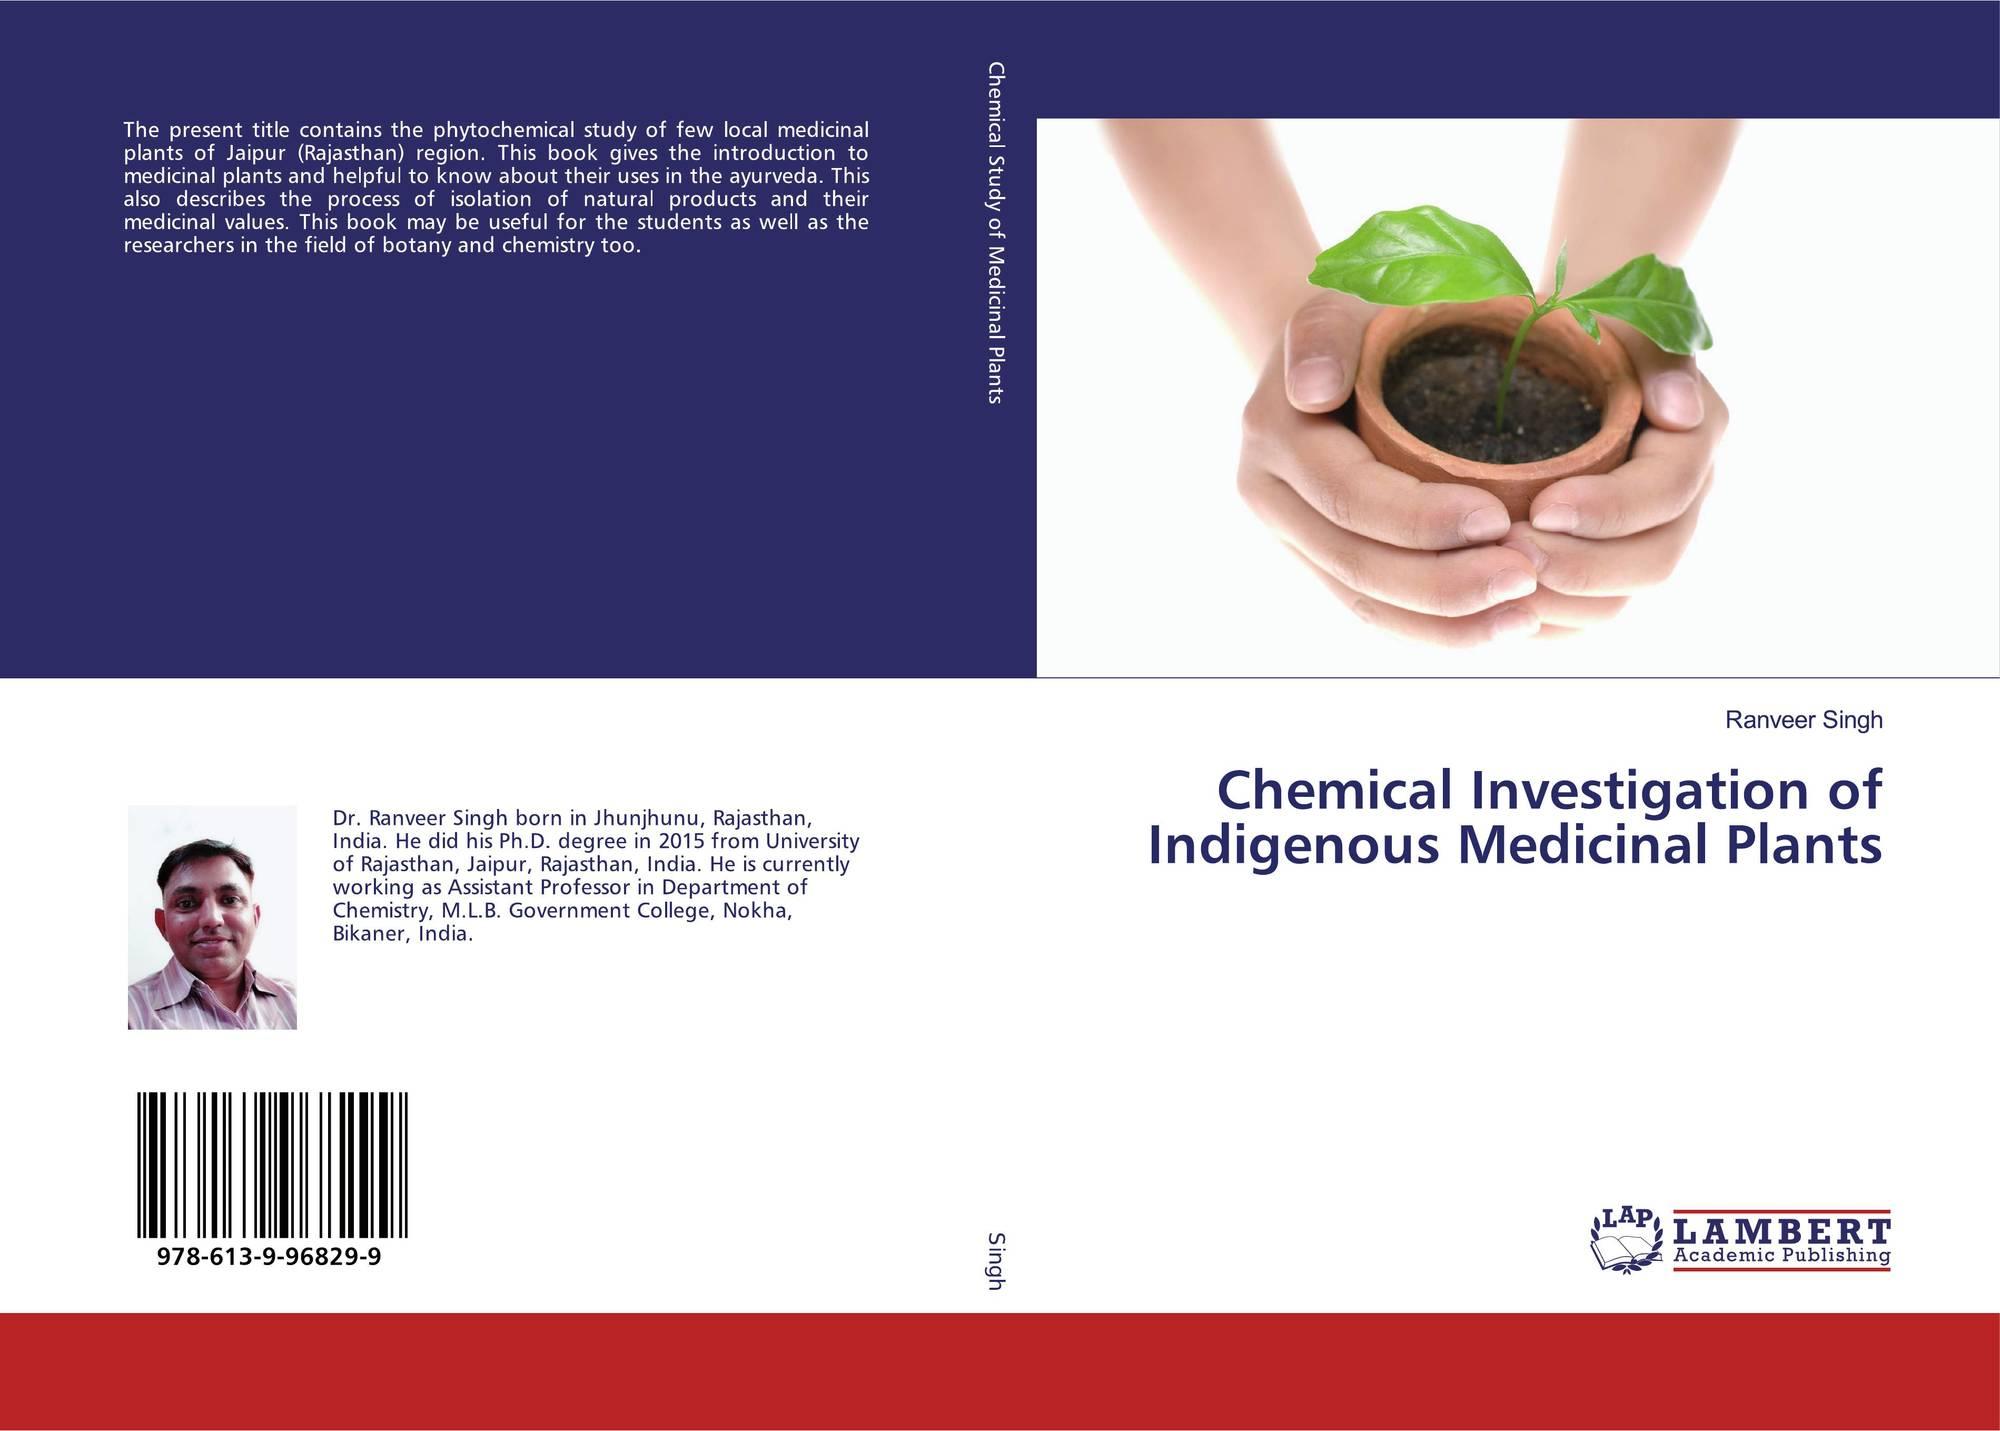 Chemical Investigation of Indigenous Medicinal Plants, 978-613-9